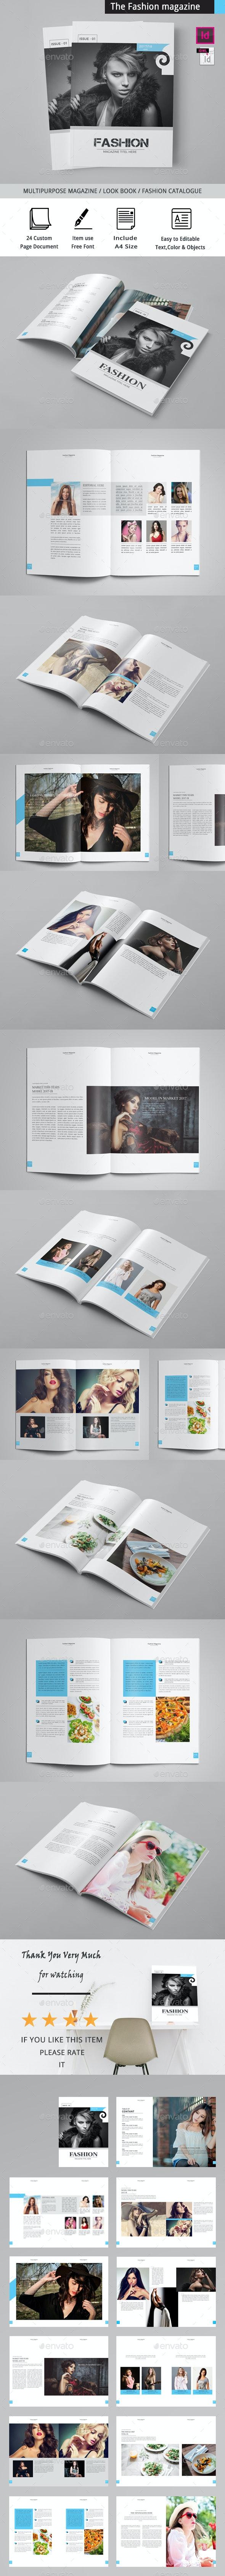 The Fashion Magazine - Magazines Print Templates